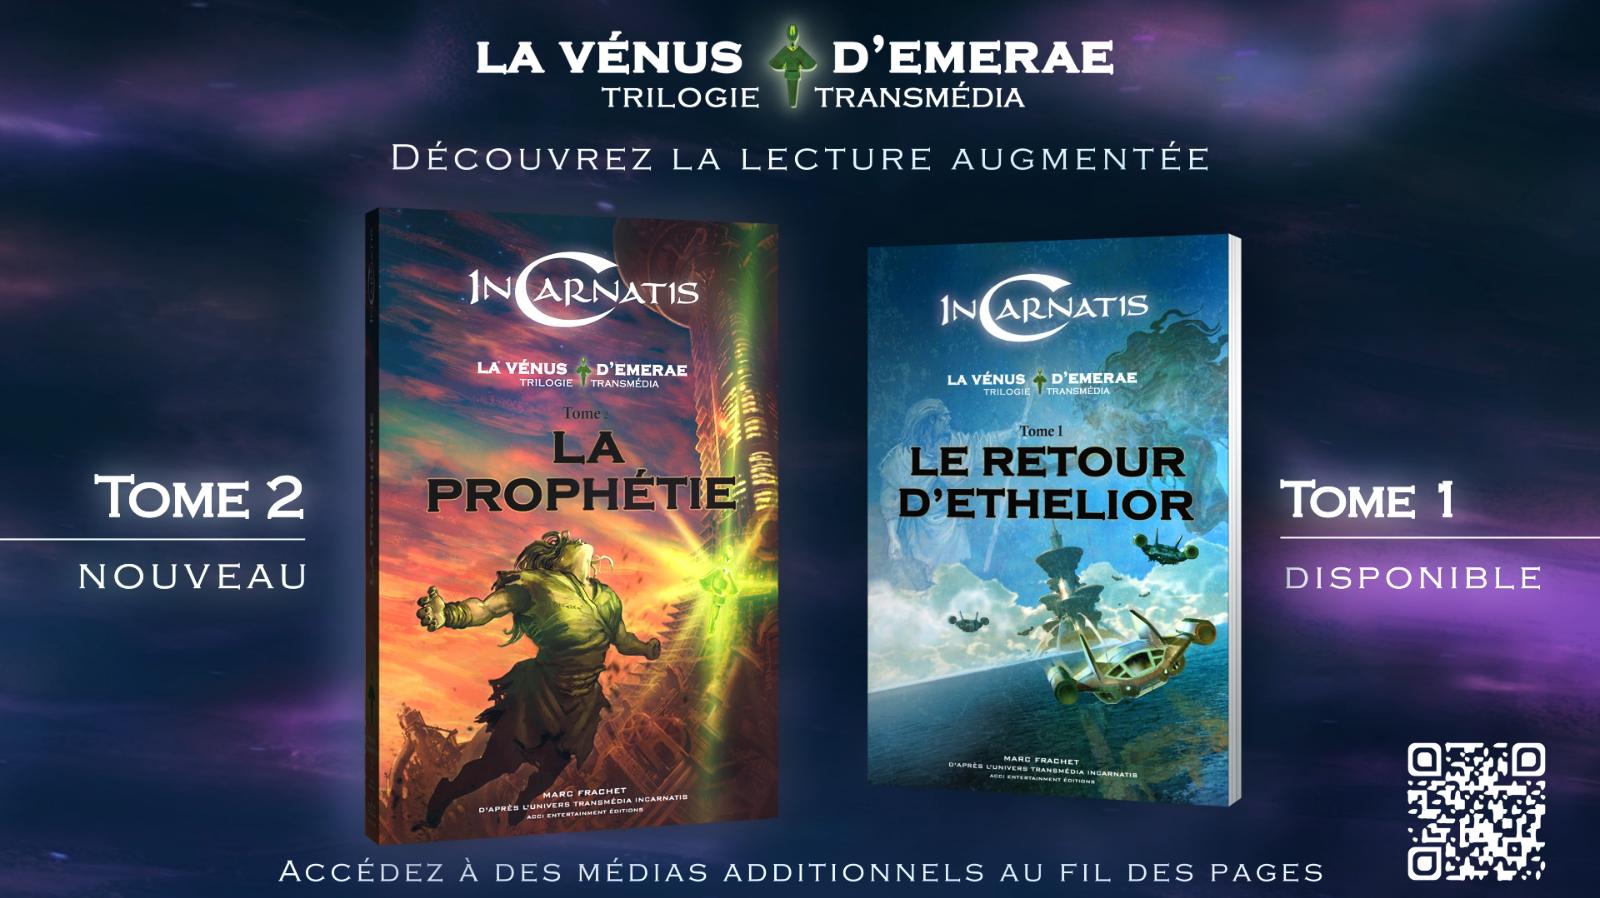 InCarnatis, La Prophétie, tome 2 de la trilogie transmédia InCarnatis La Vénus d'Emerae